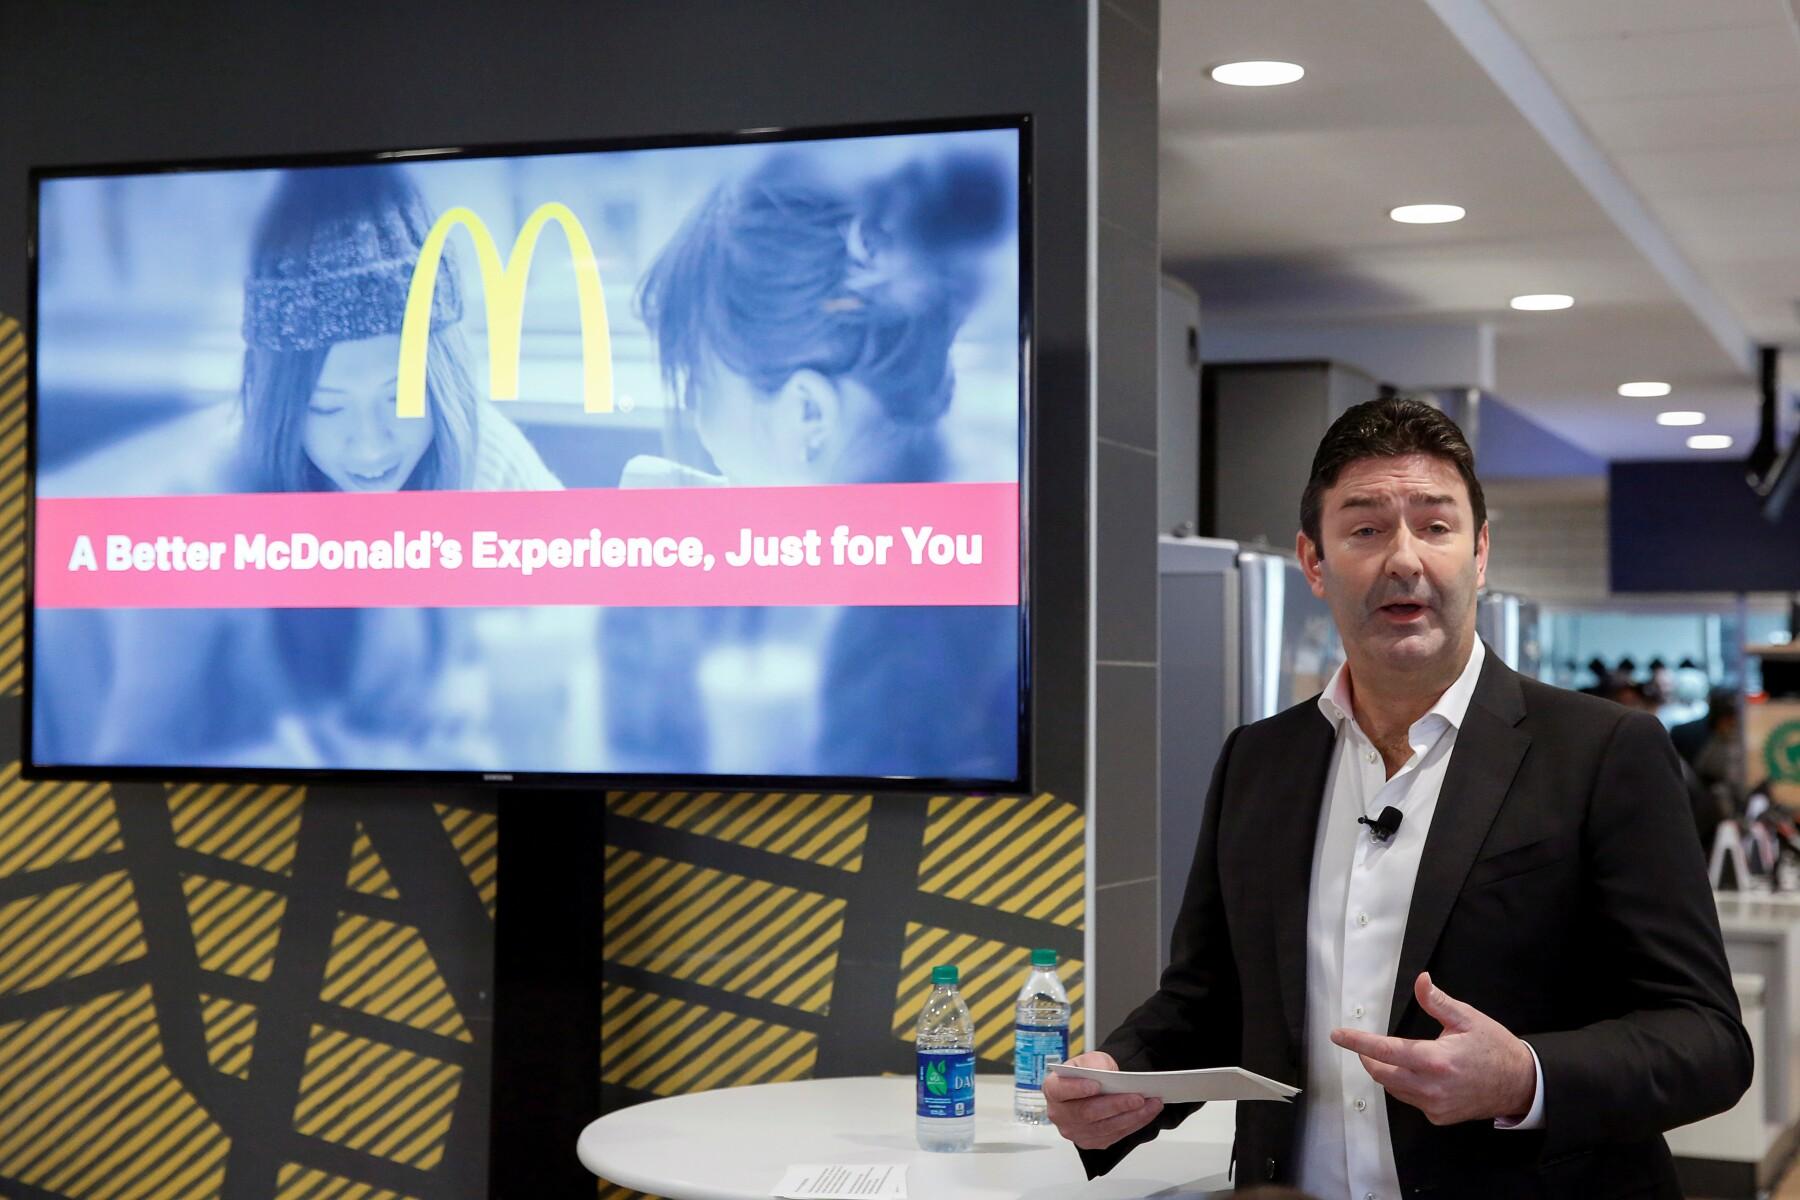 Stephen-Easterbrook-McDonald's